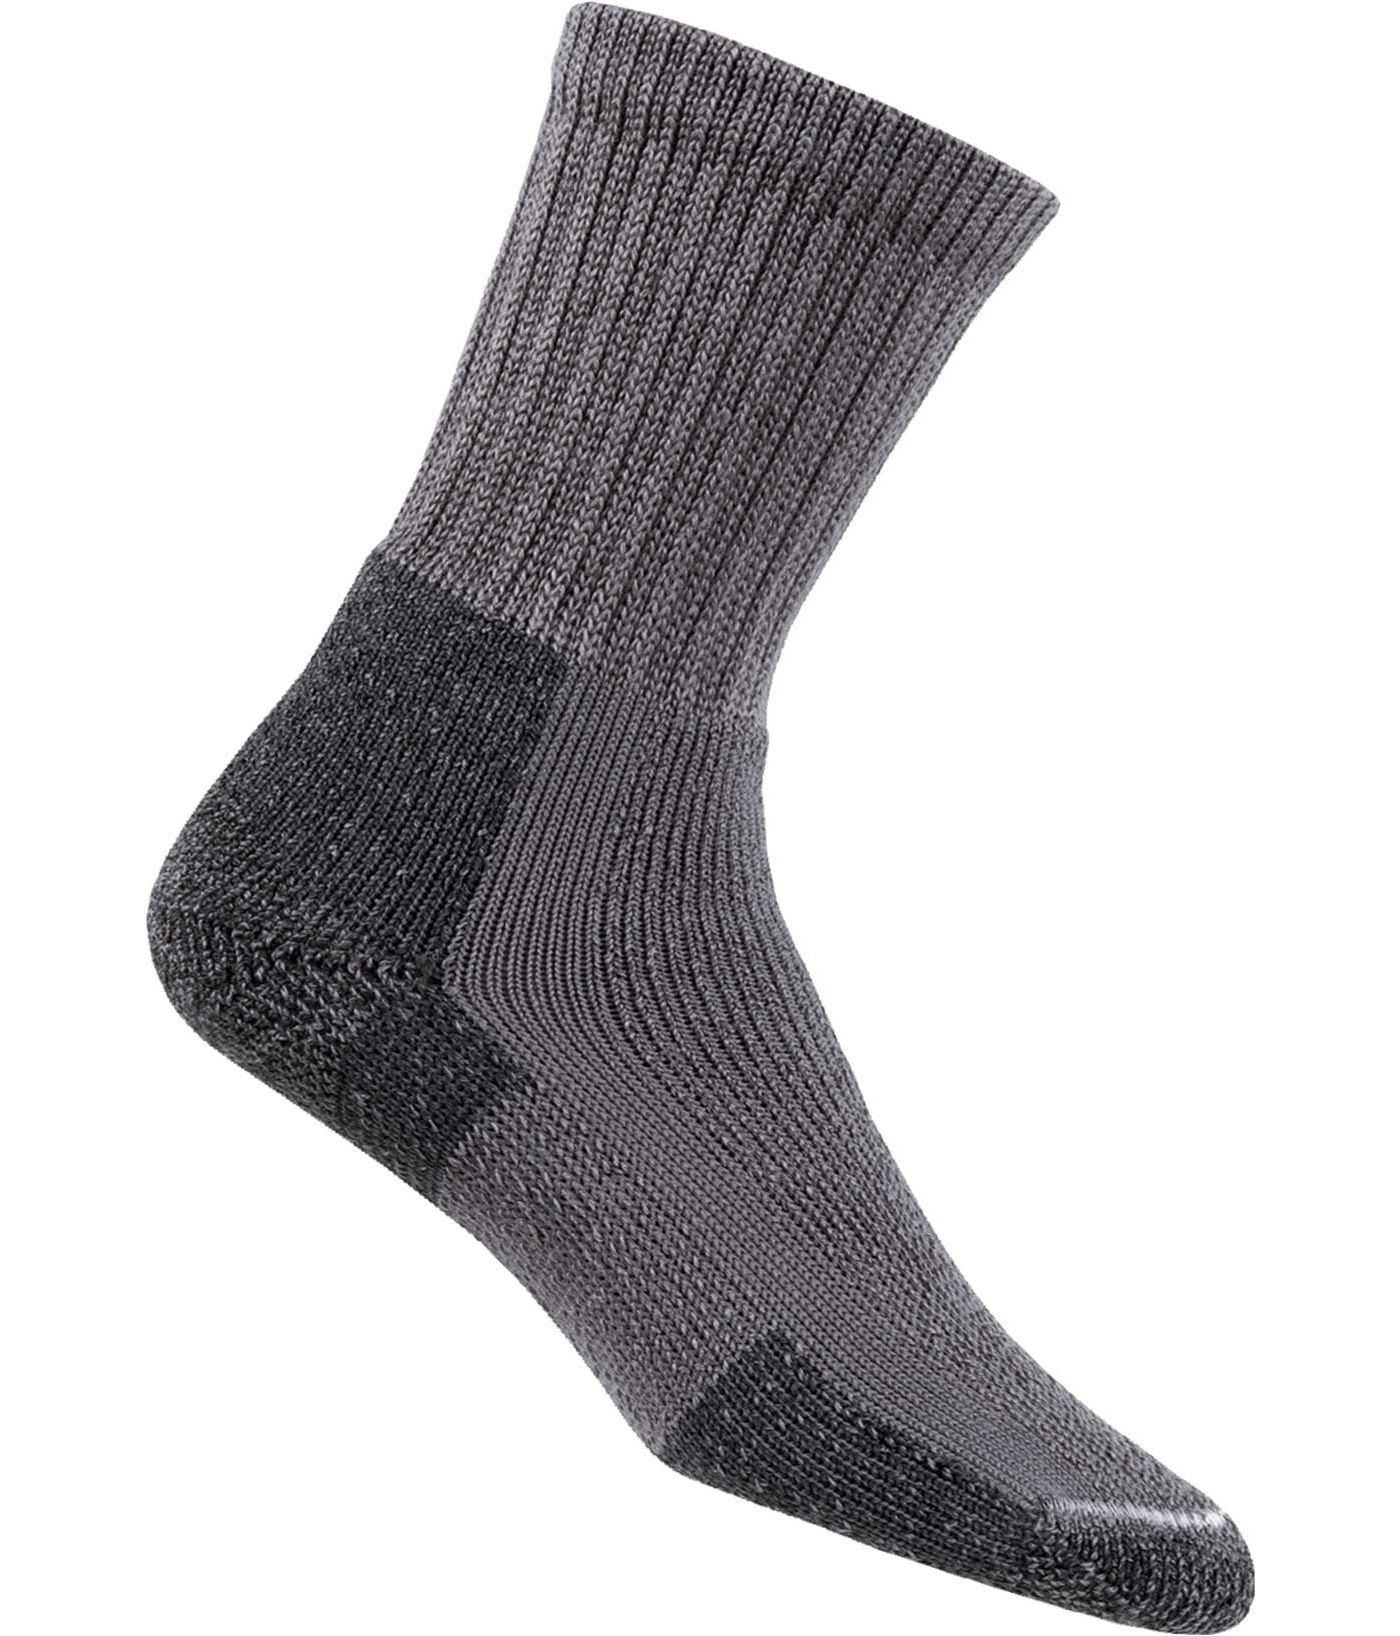 Thor-Lo Men's Hiking Crew Socks